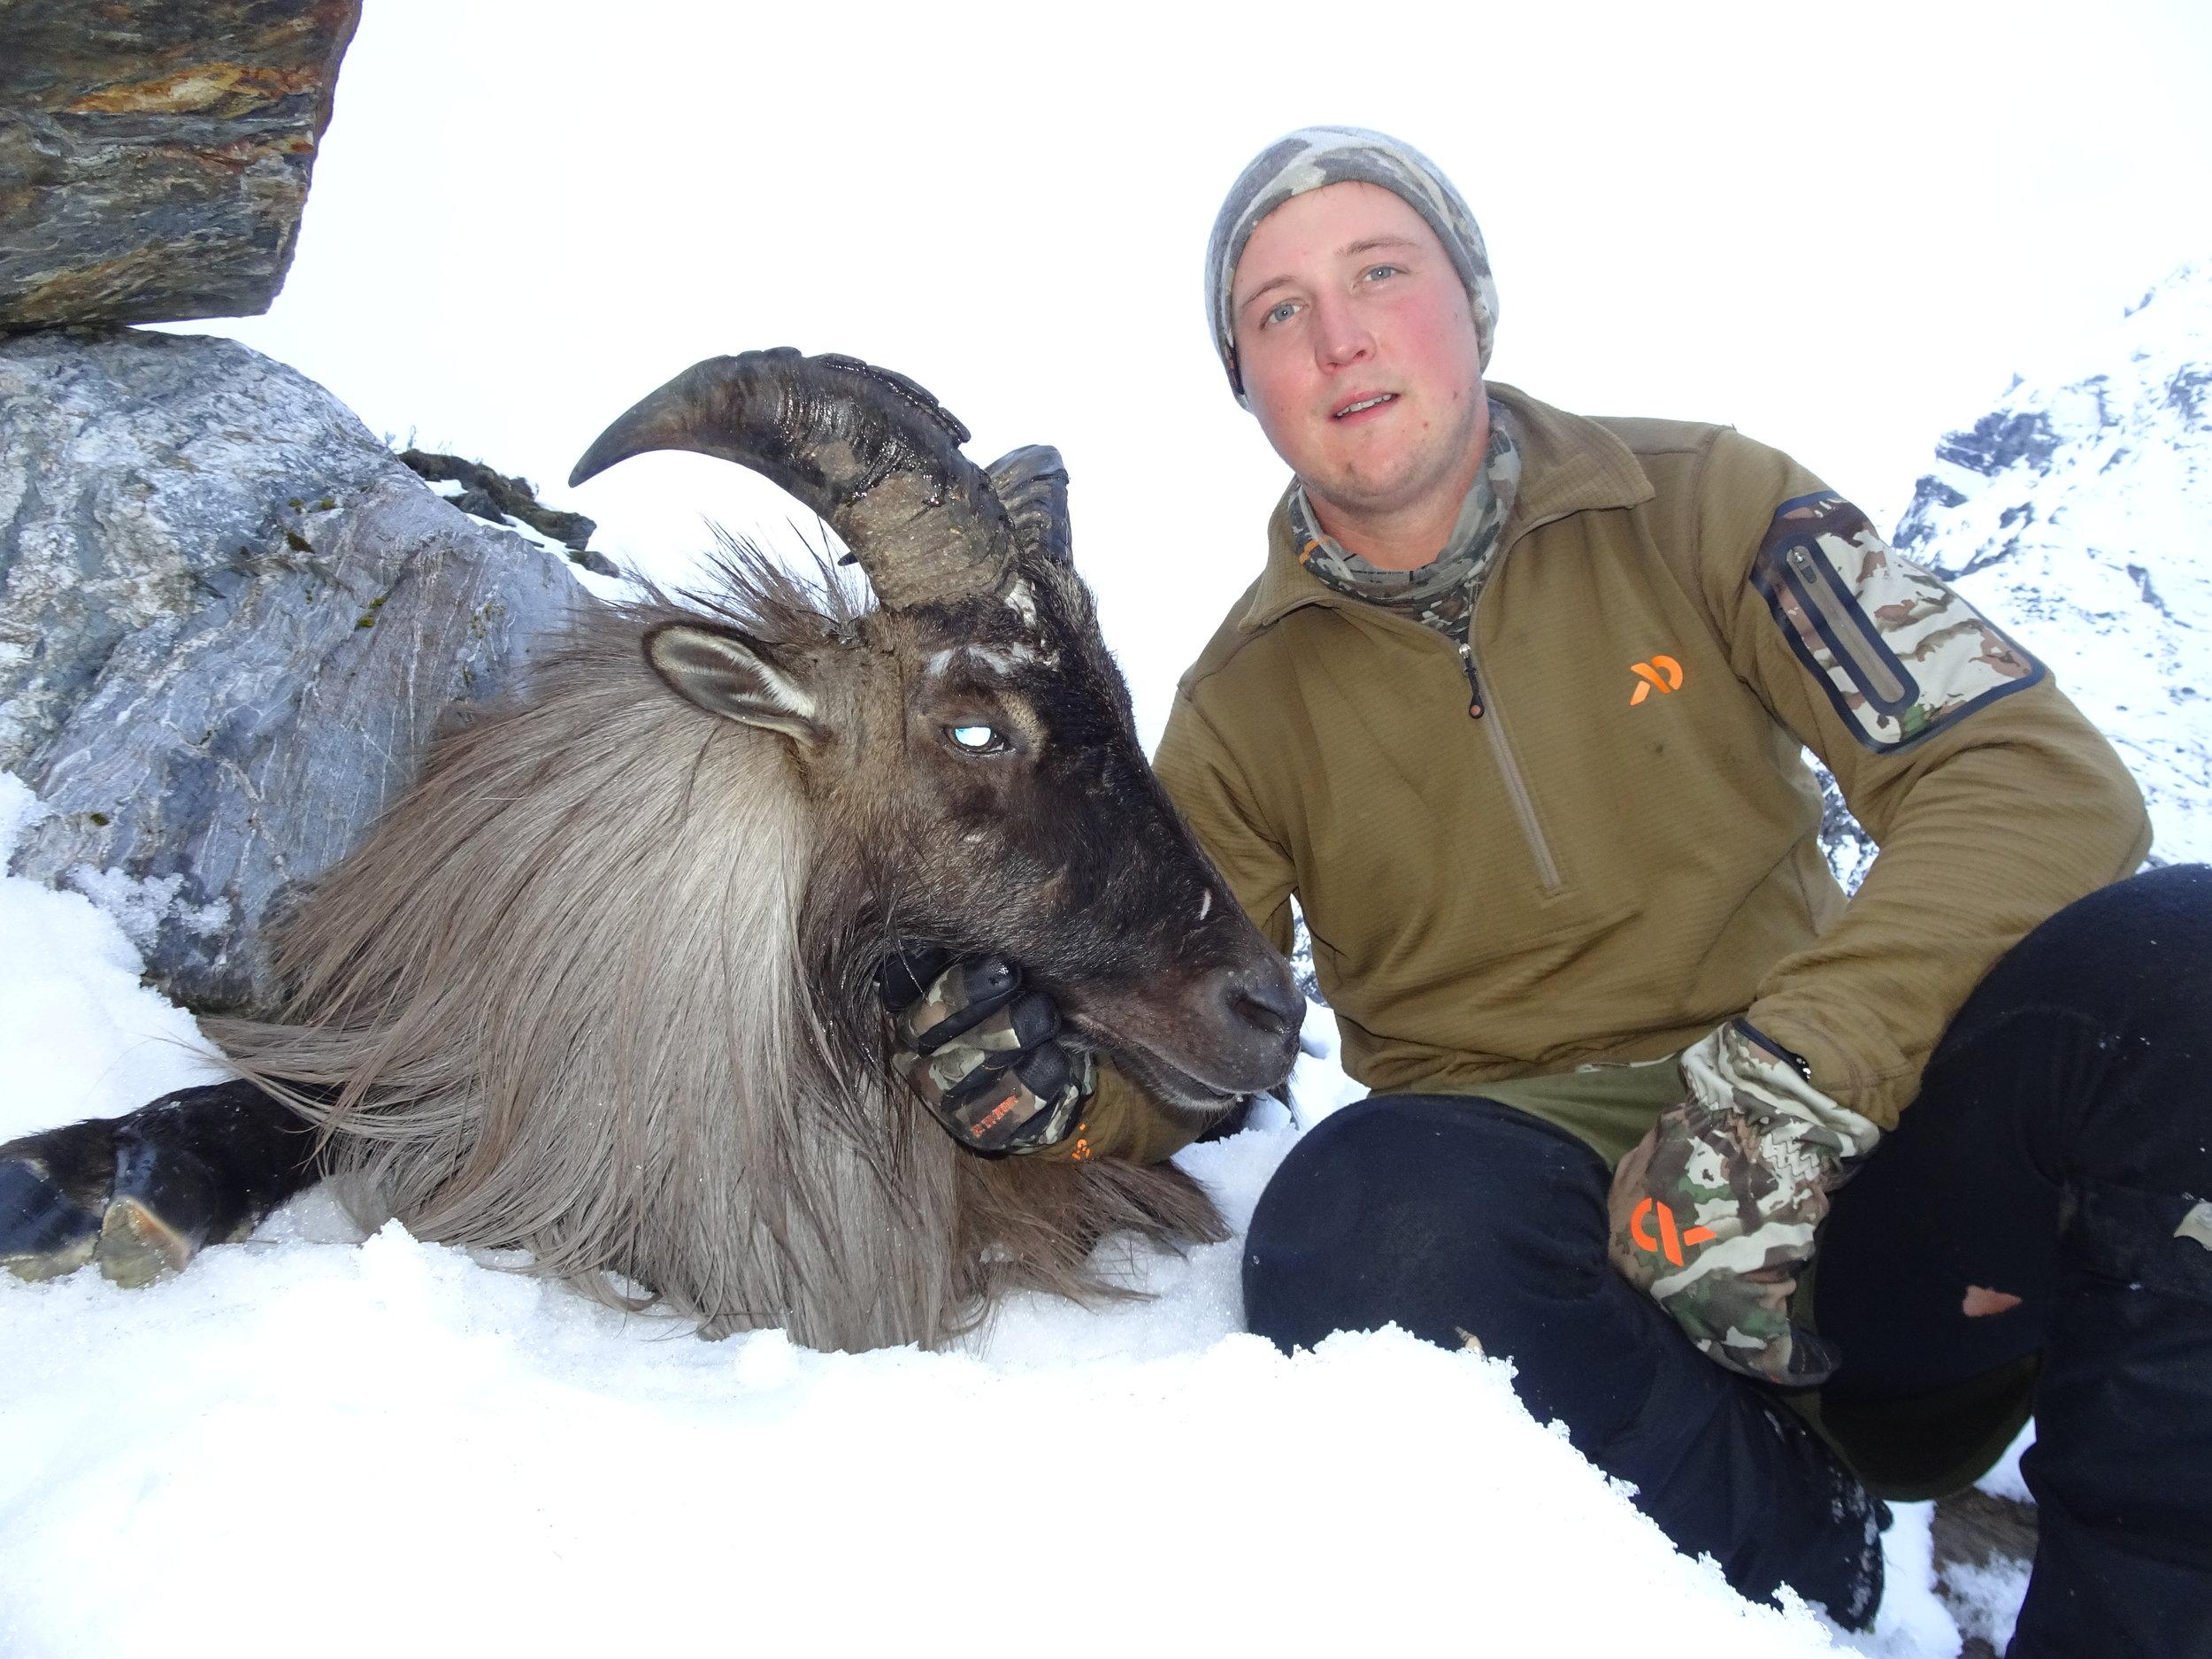 Luke Potts with a nice old bull - image @Tom Overton